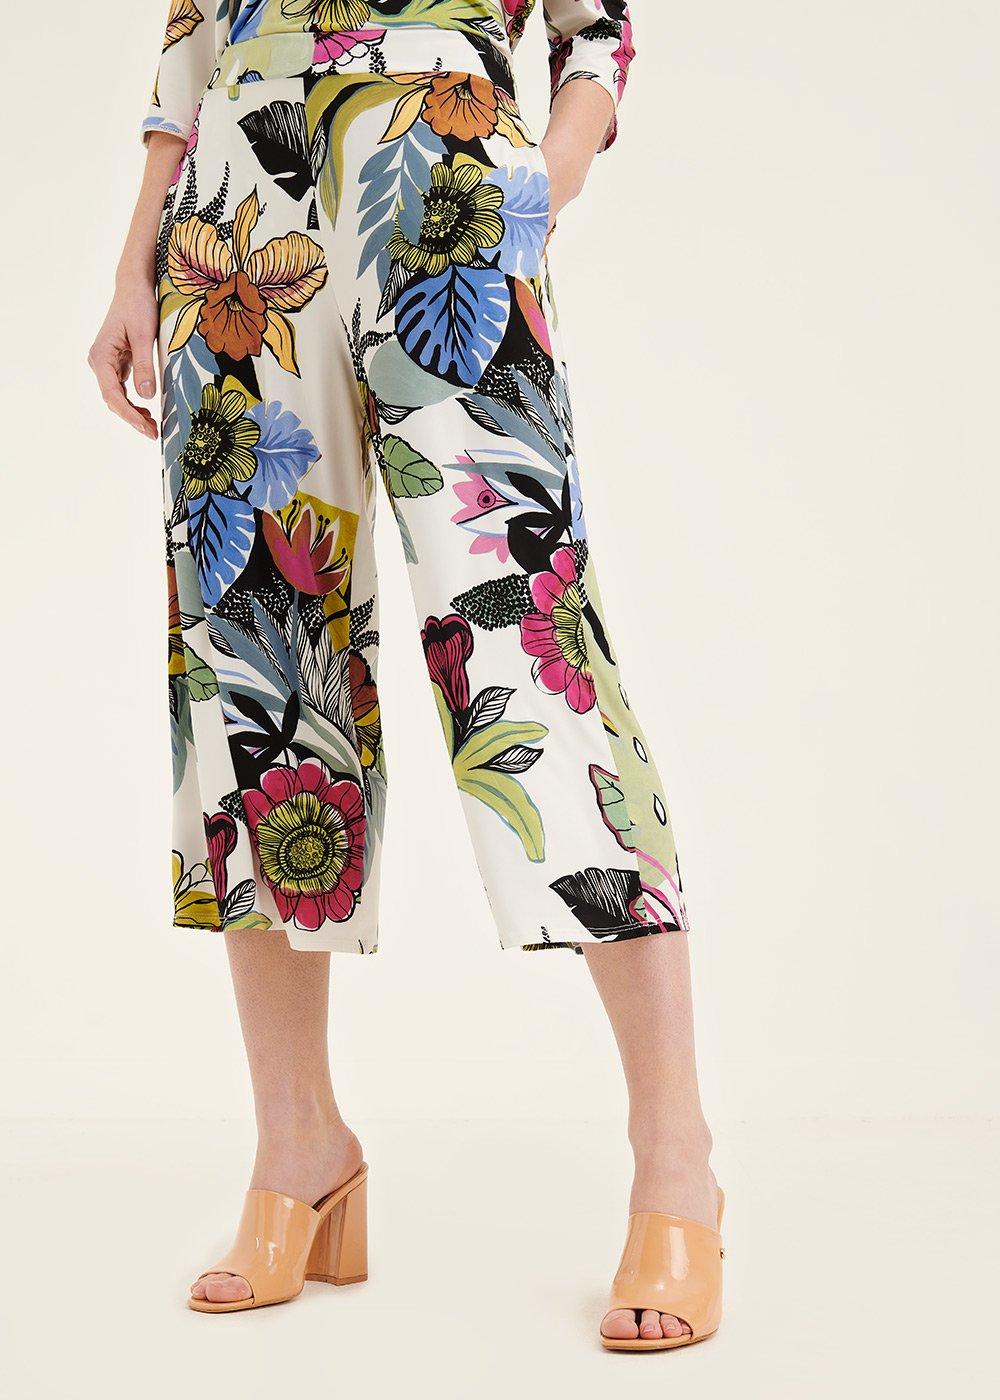 Megan floral print trousers - White /  Curcuma Fantasia - Woman